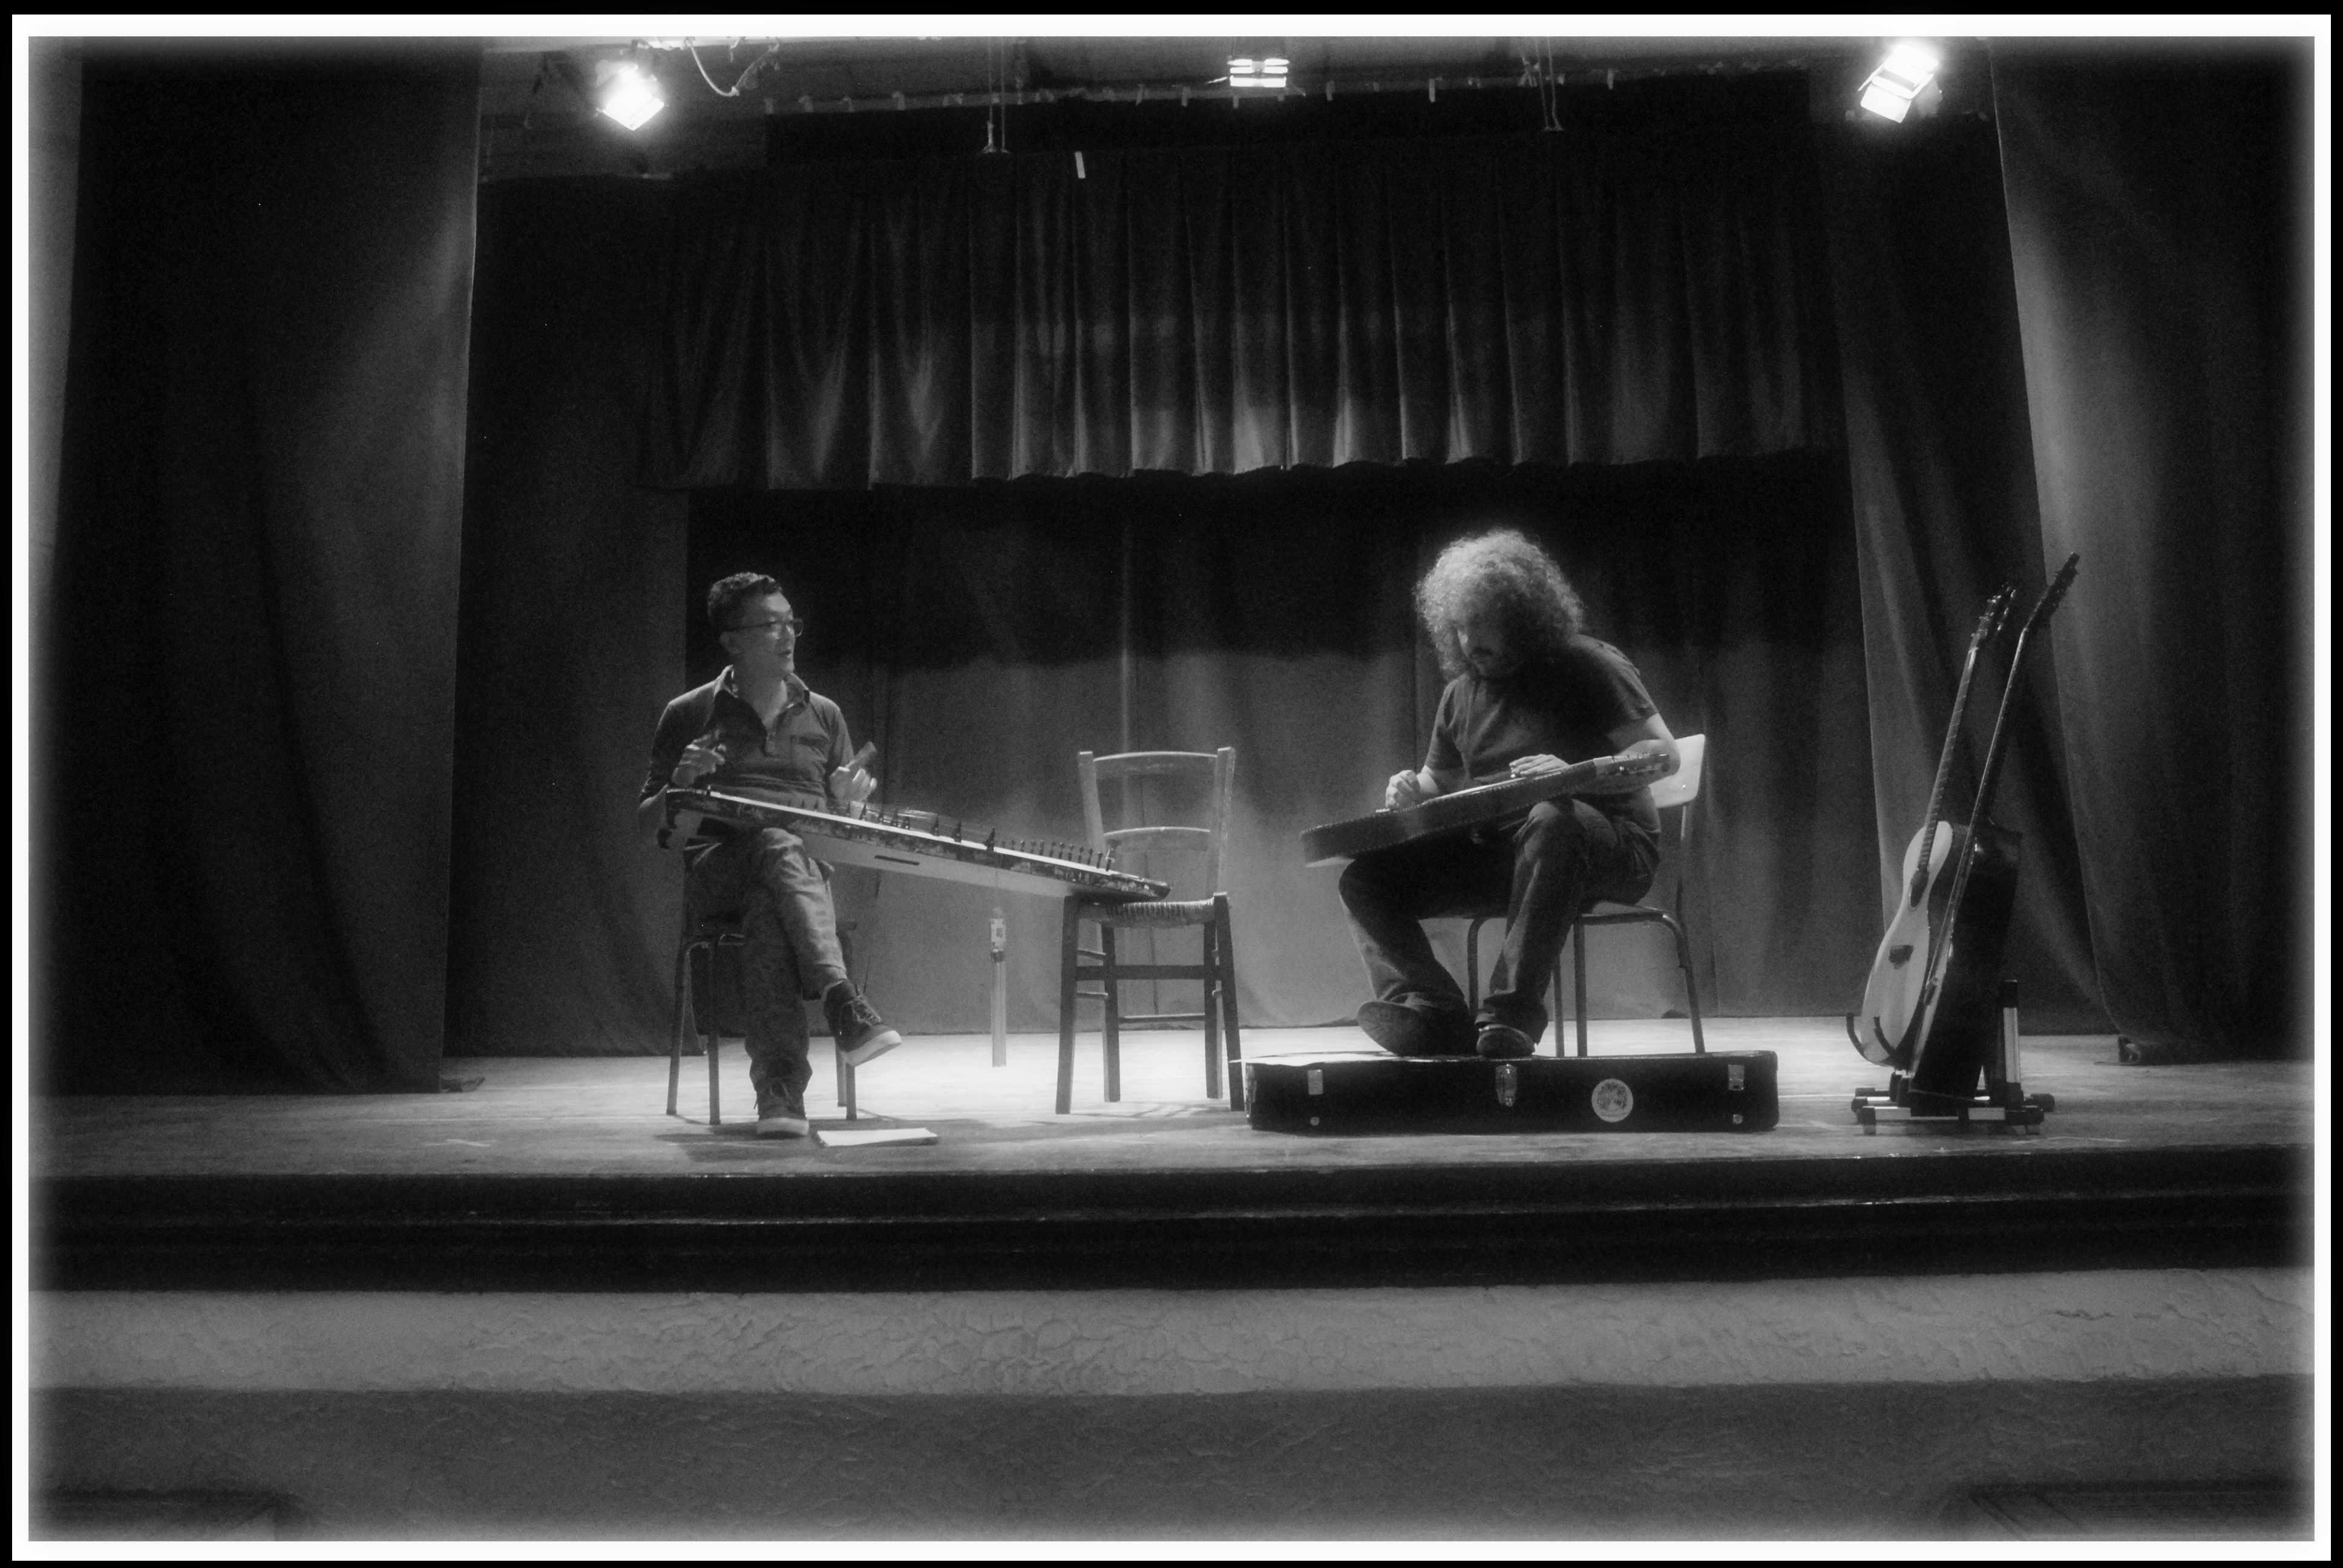 Tri Nguyen (Dan Tranh Zither) Roberto Diana (Weissenborn) Live video